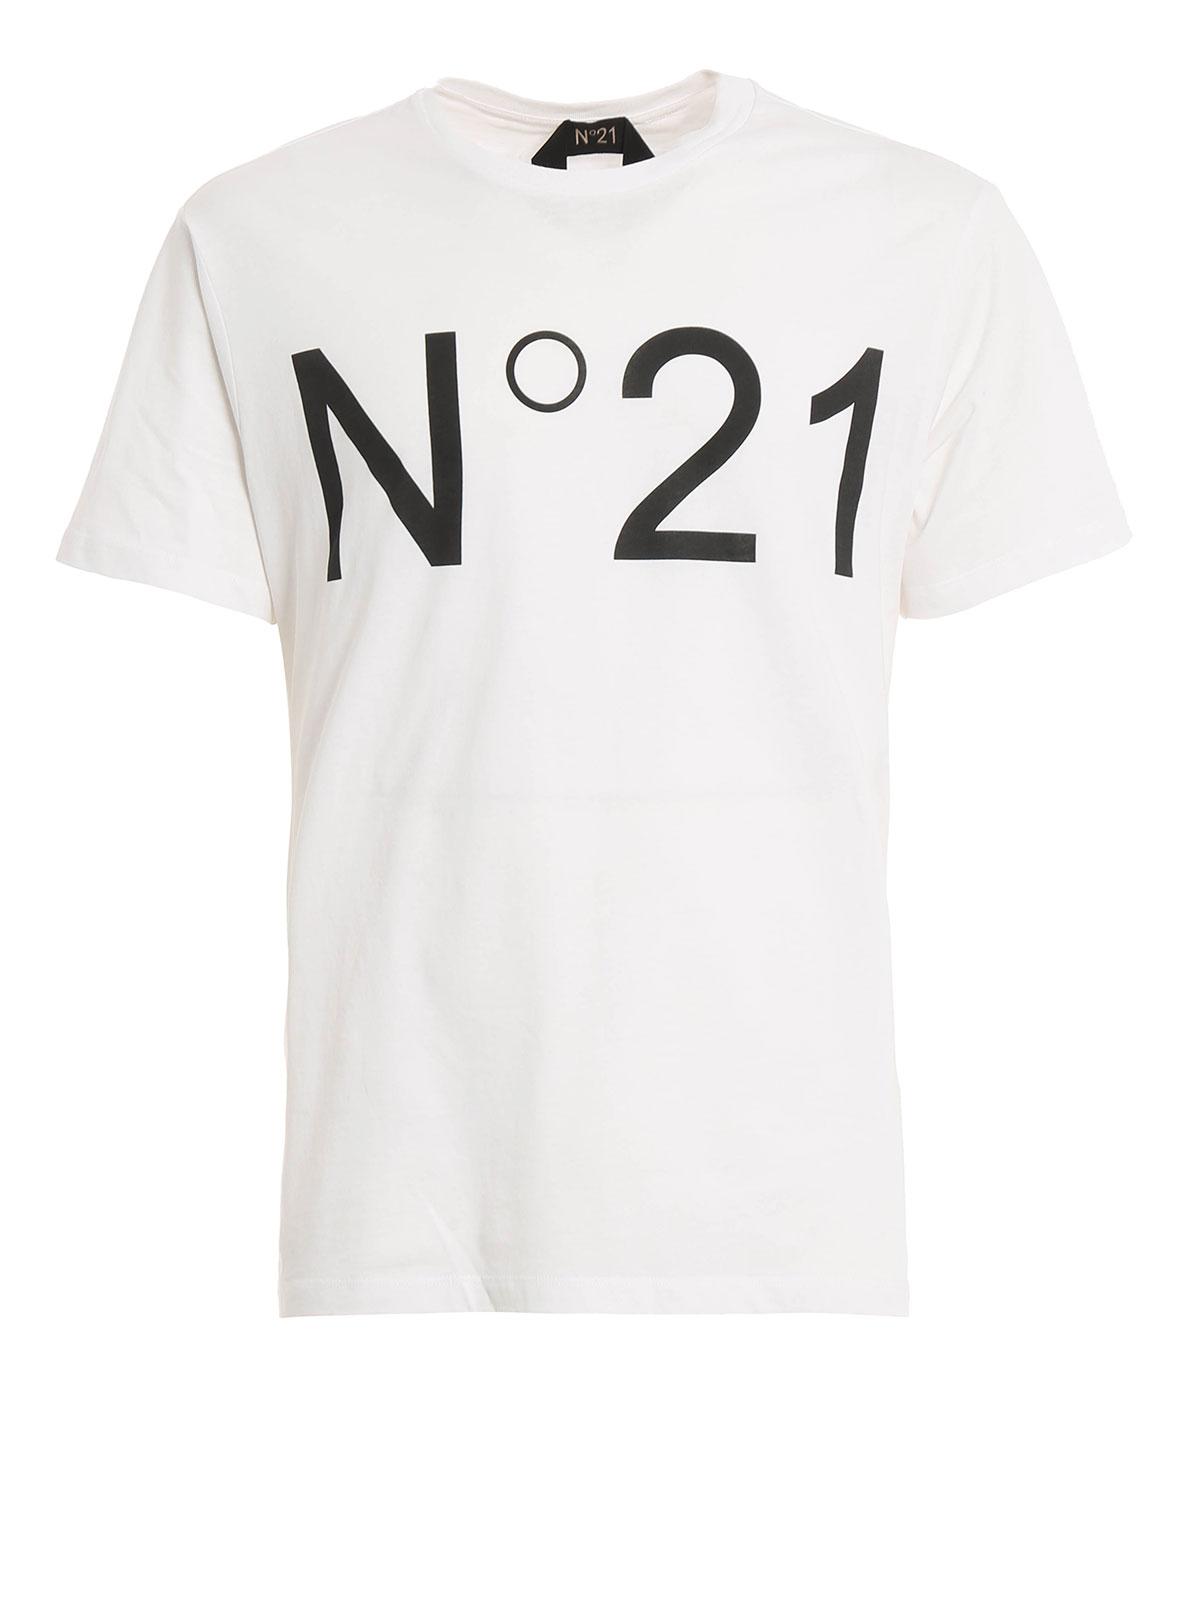 Logo print t shirt by n 21 t shirts ikrix for Logo for t shirt printing